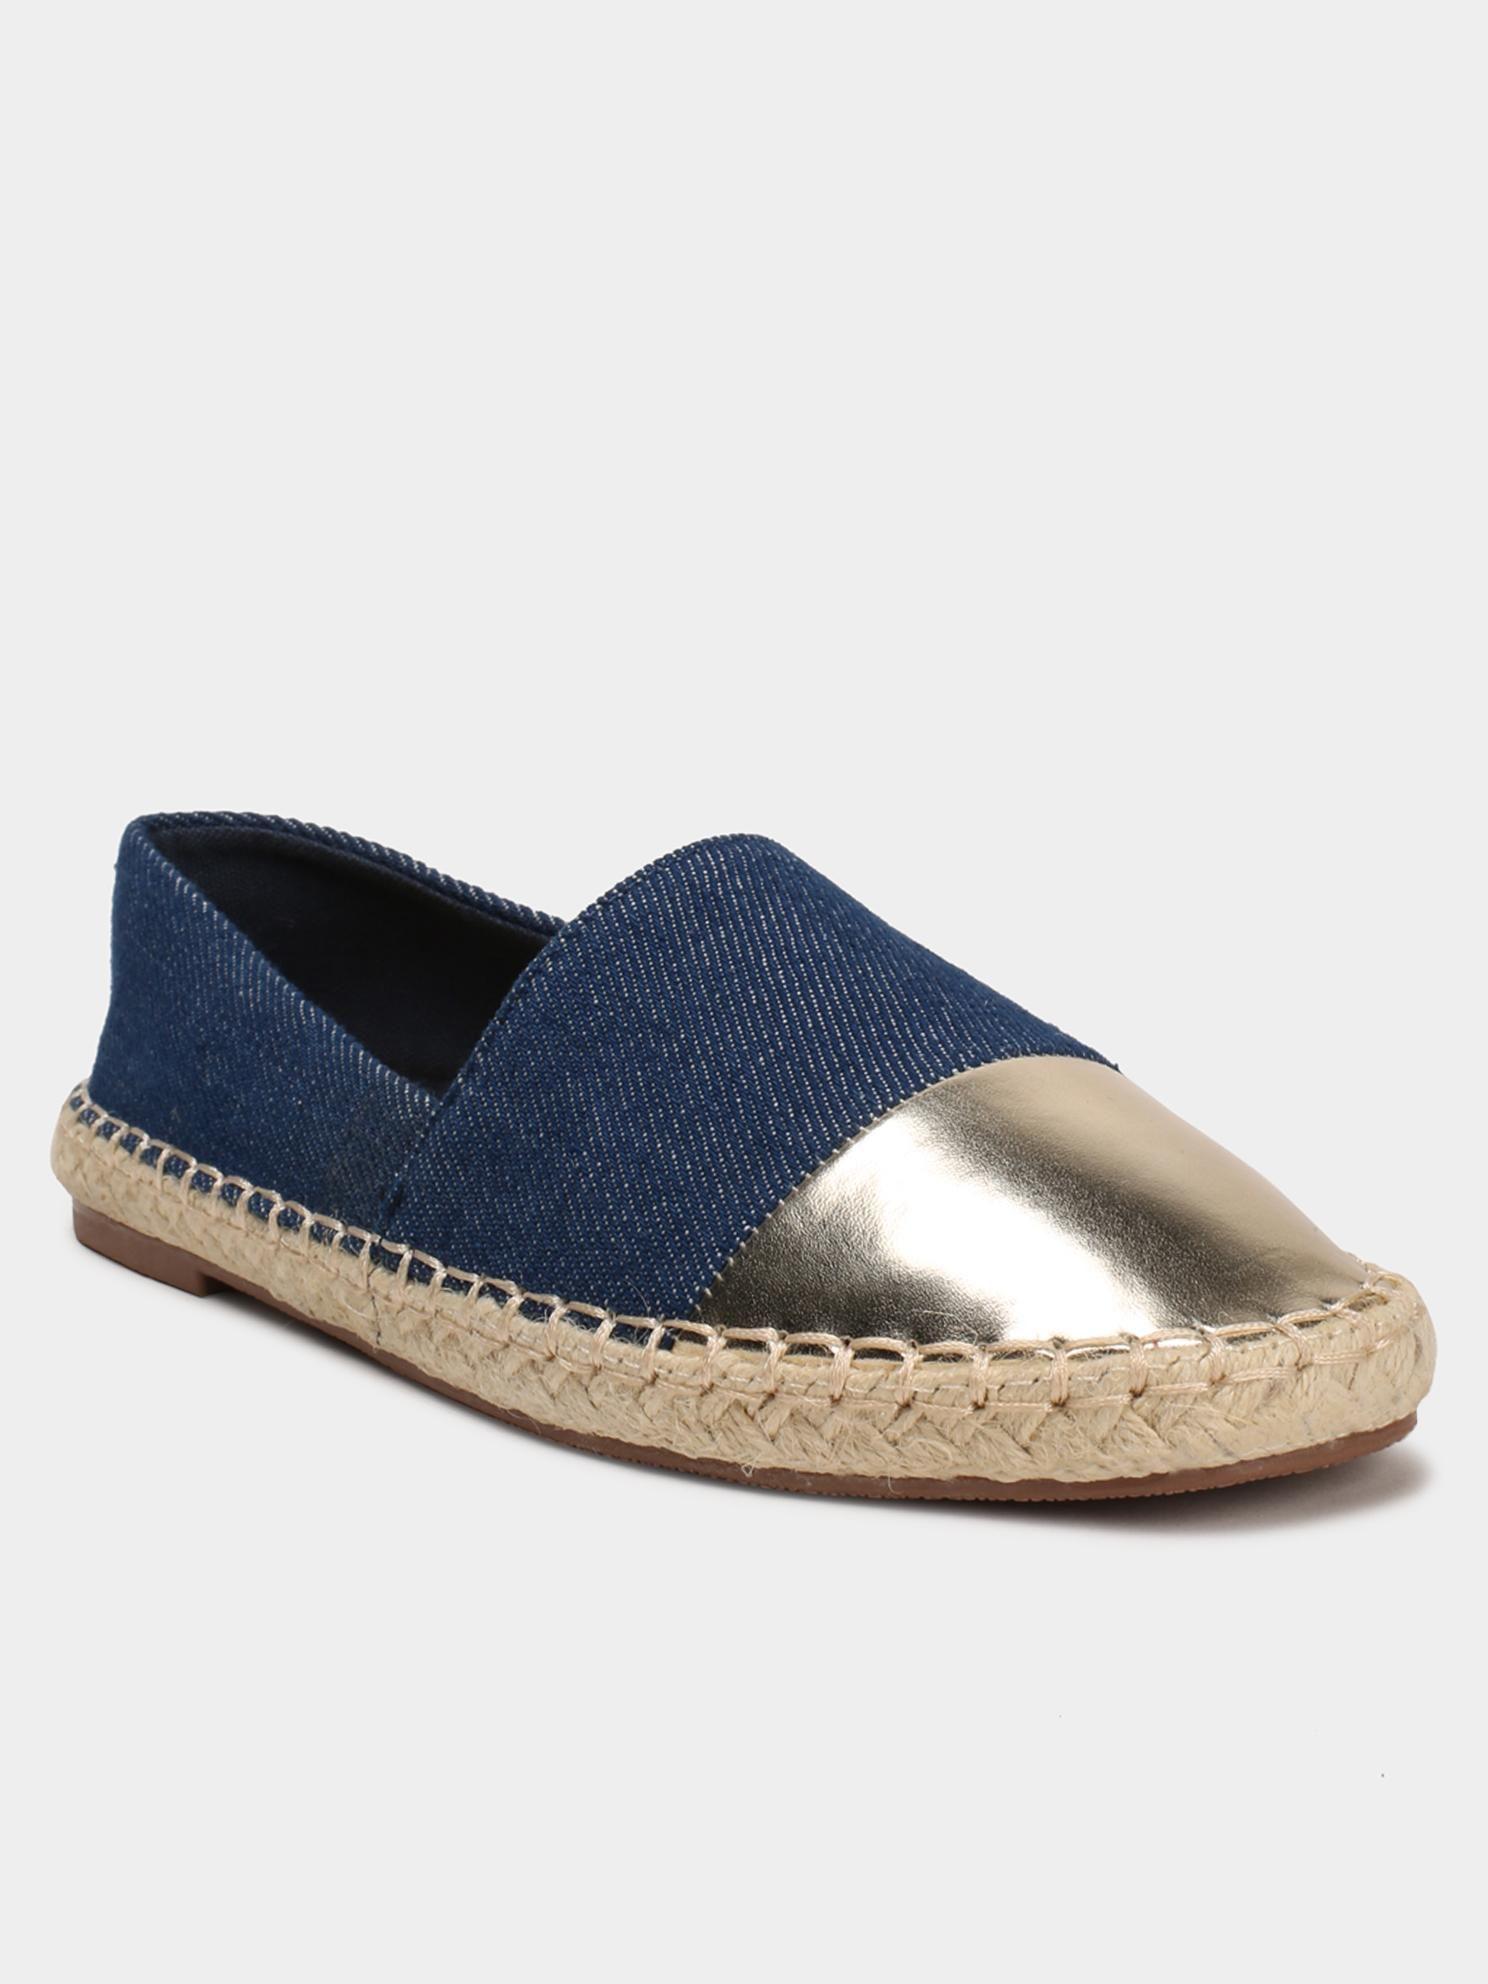 c066469fb5b abof Women Blue Espadrilles | #FootGear | Blue espadrilles ...